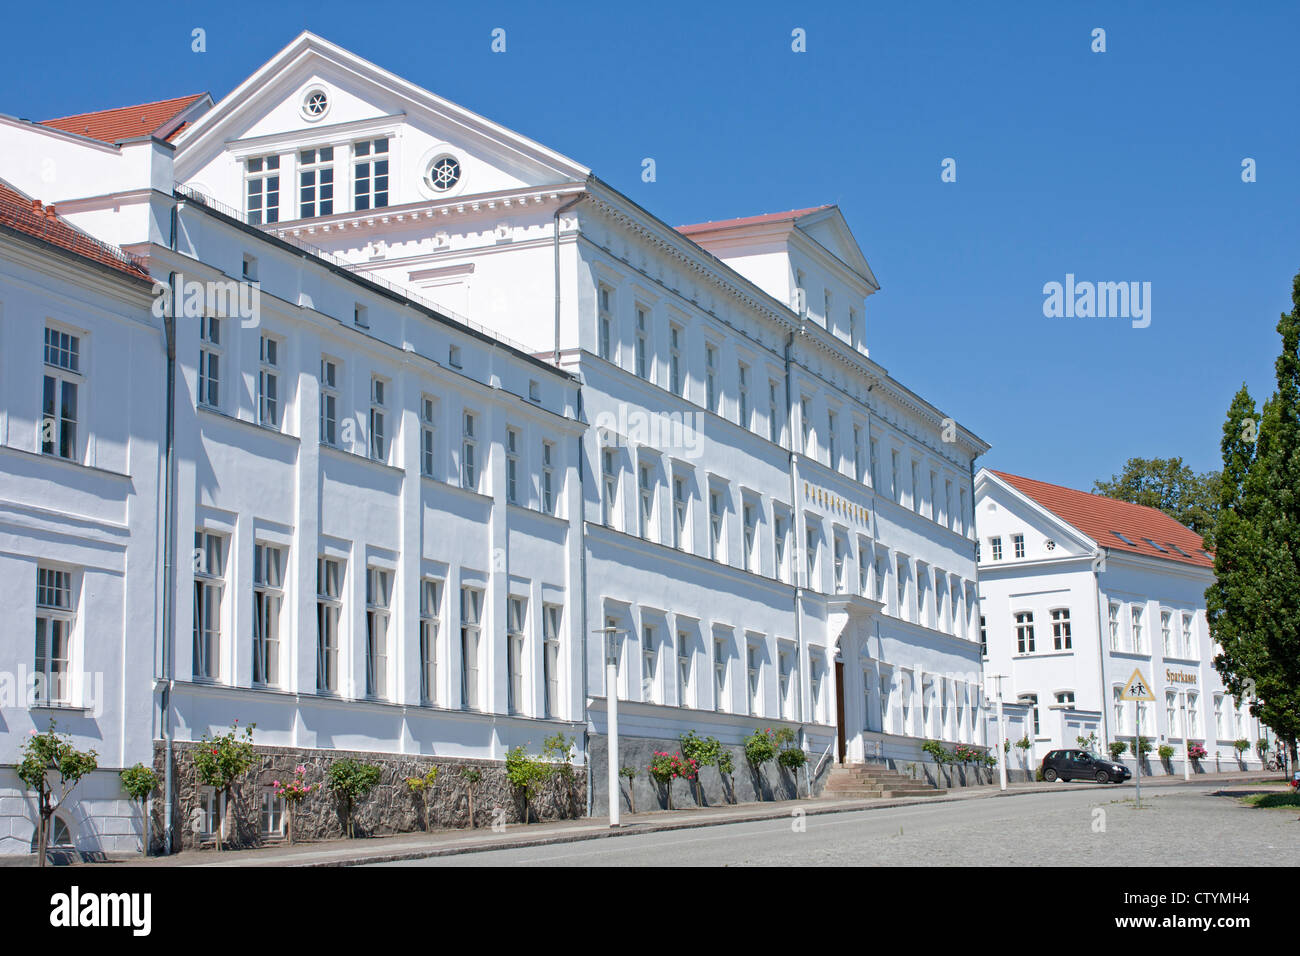 Paedagogium at the Circus, Putbus, Ruegen Island, Baltic Sea Coast, Mecklenburg-West Pomerania, Germany Stock Photo